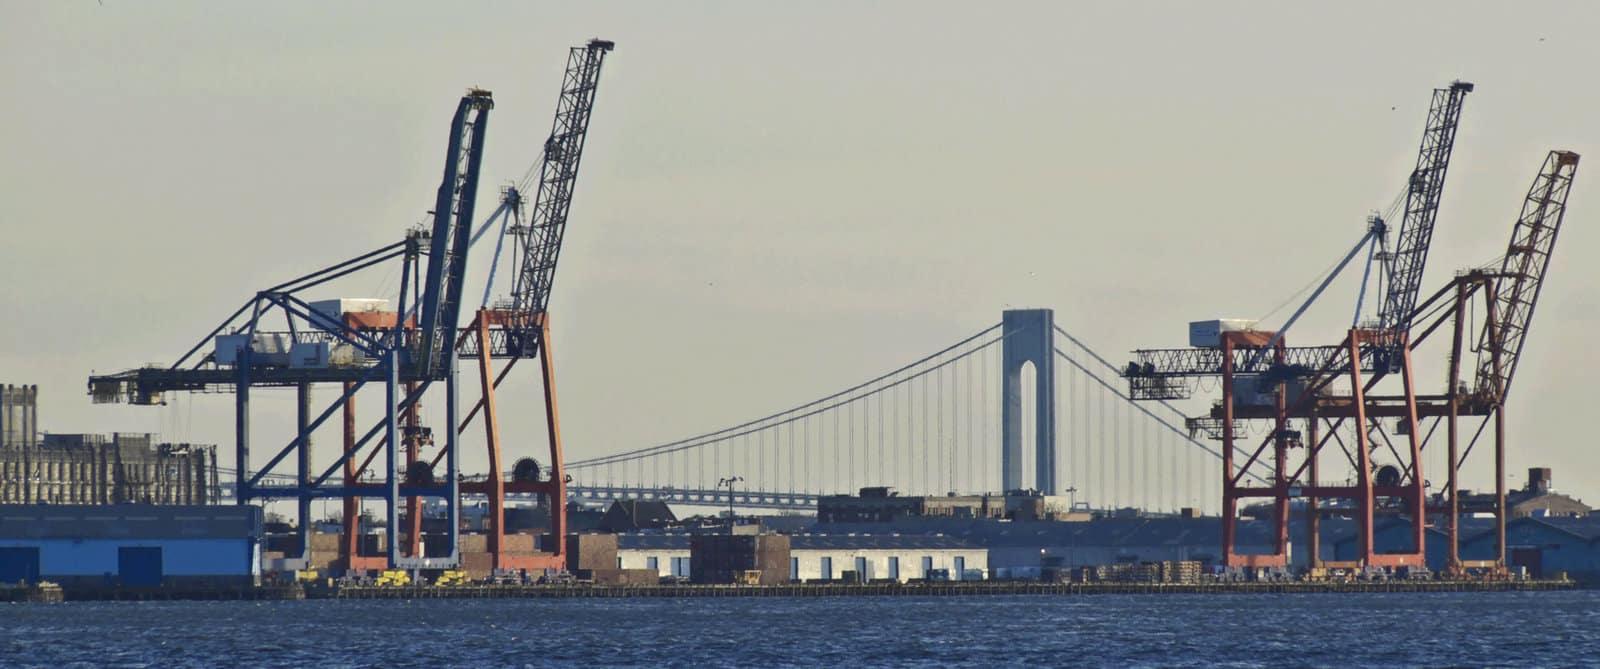 Eltingville Staten Island, NY Private Investigator